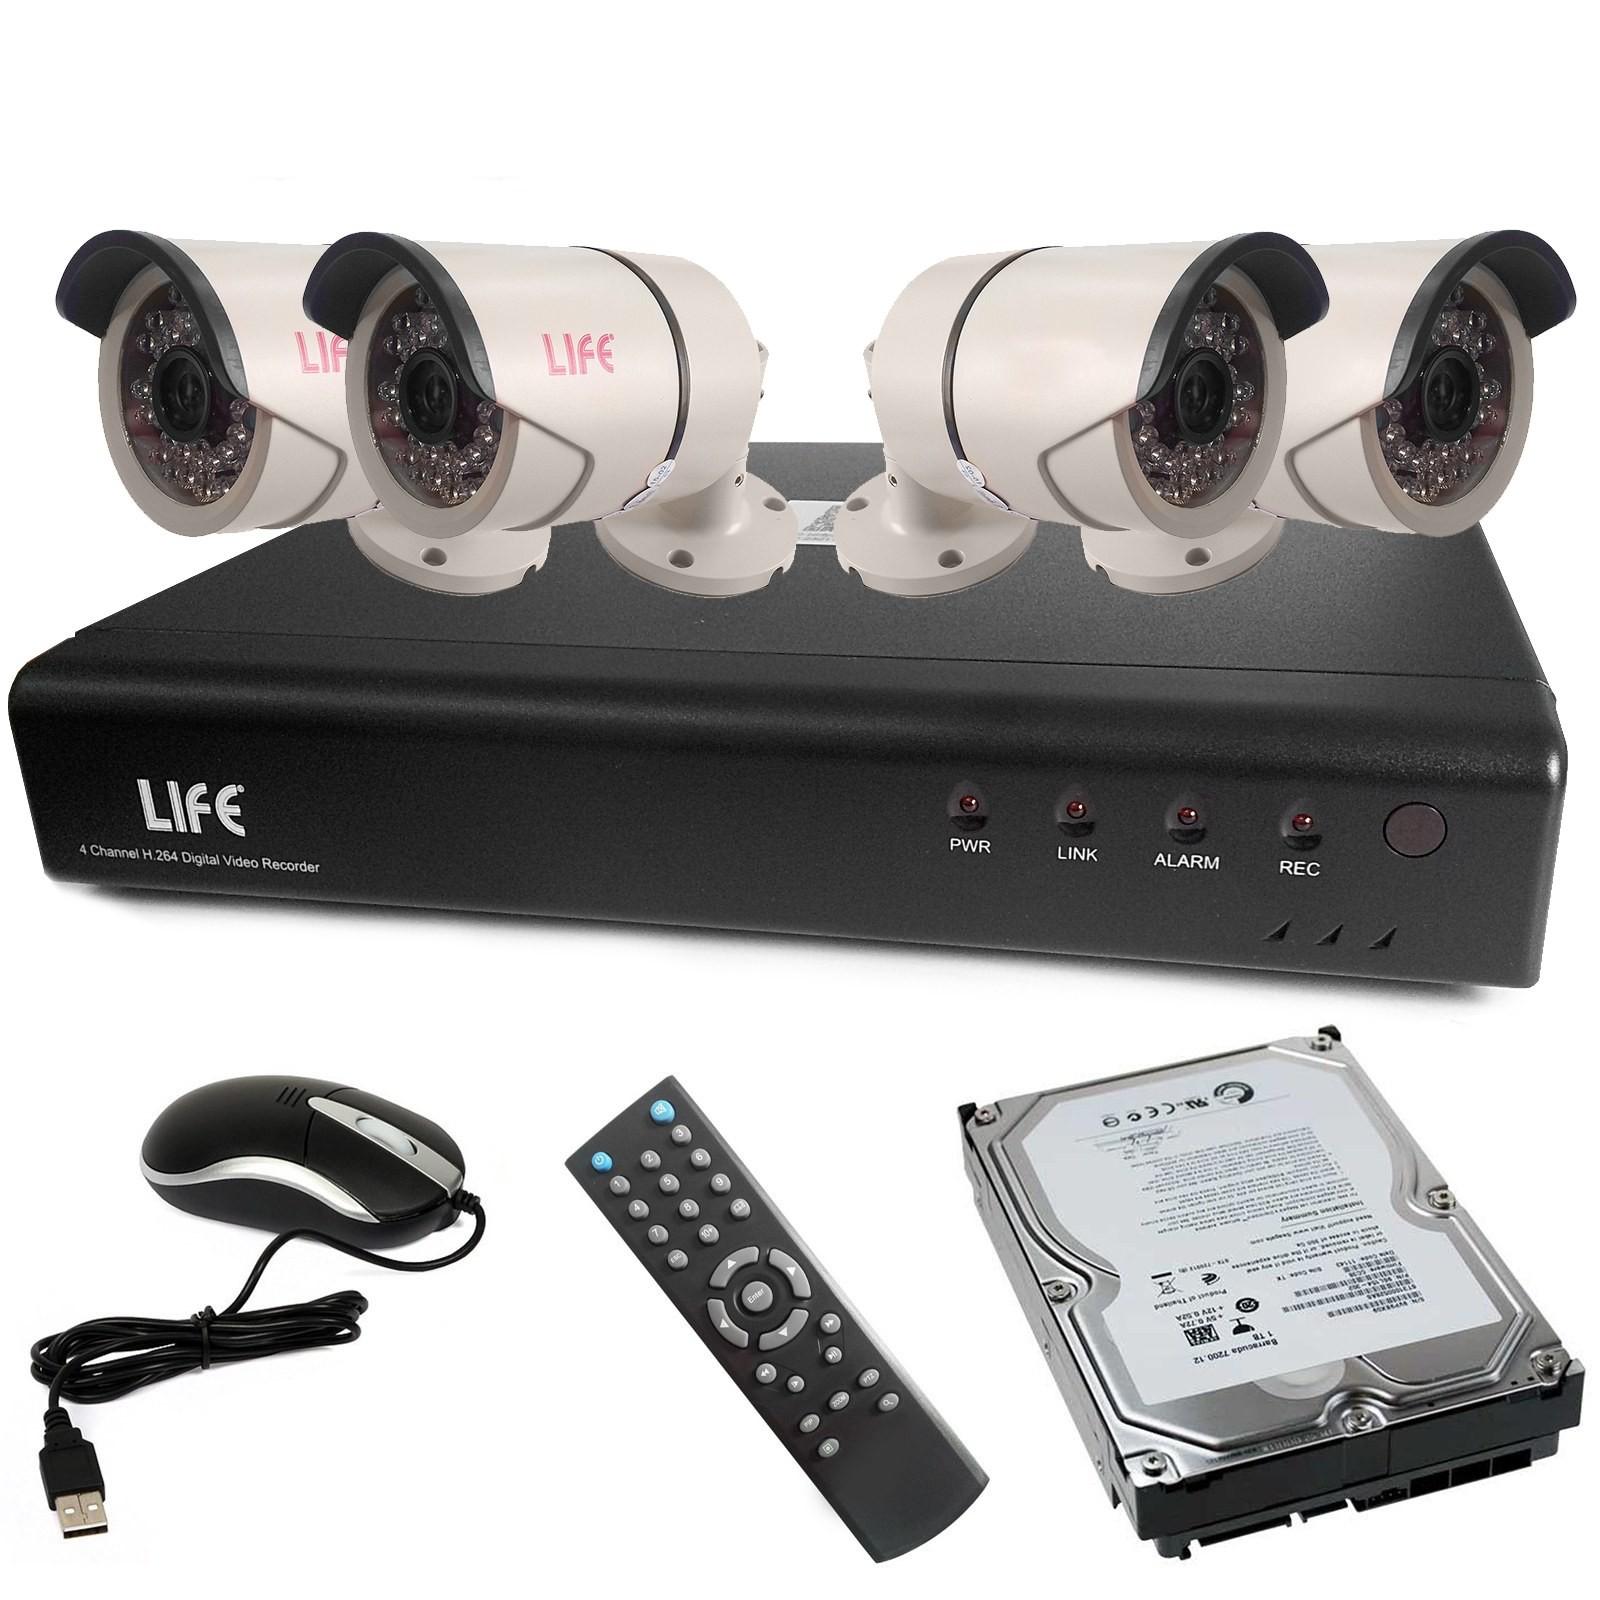 Kit DVR Videosorveglianza TvCC 4 Canali HD 720P LIFE Telecamere Hard disk 1 Tera Vultech Life ...